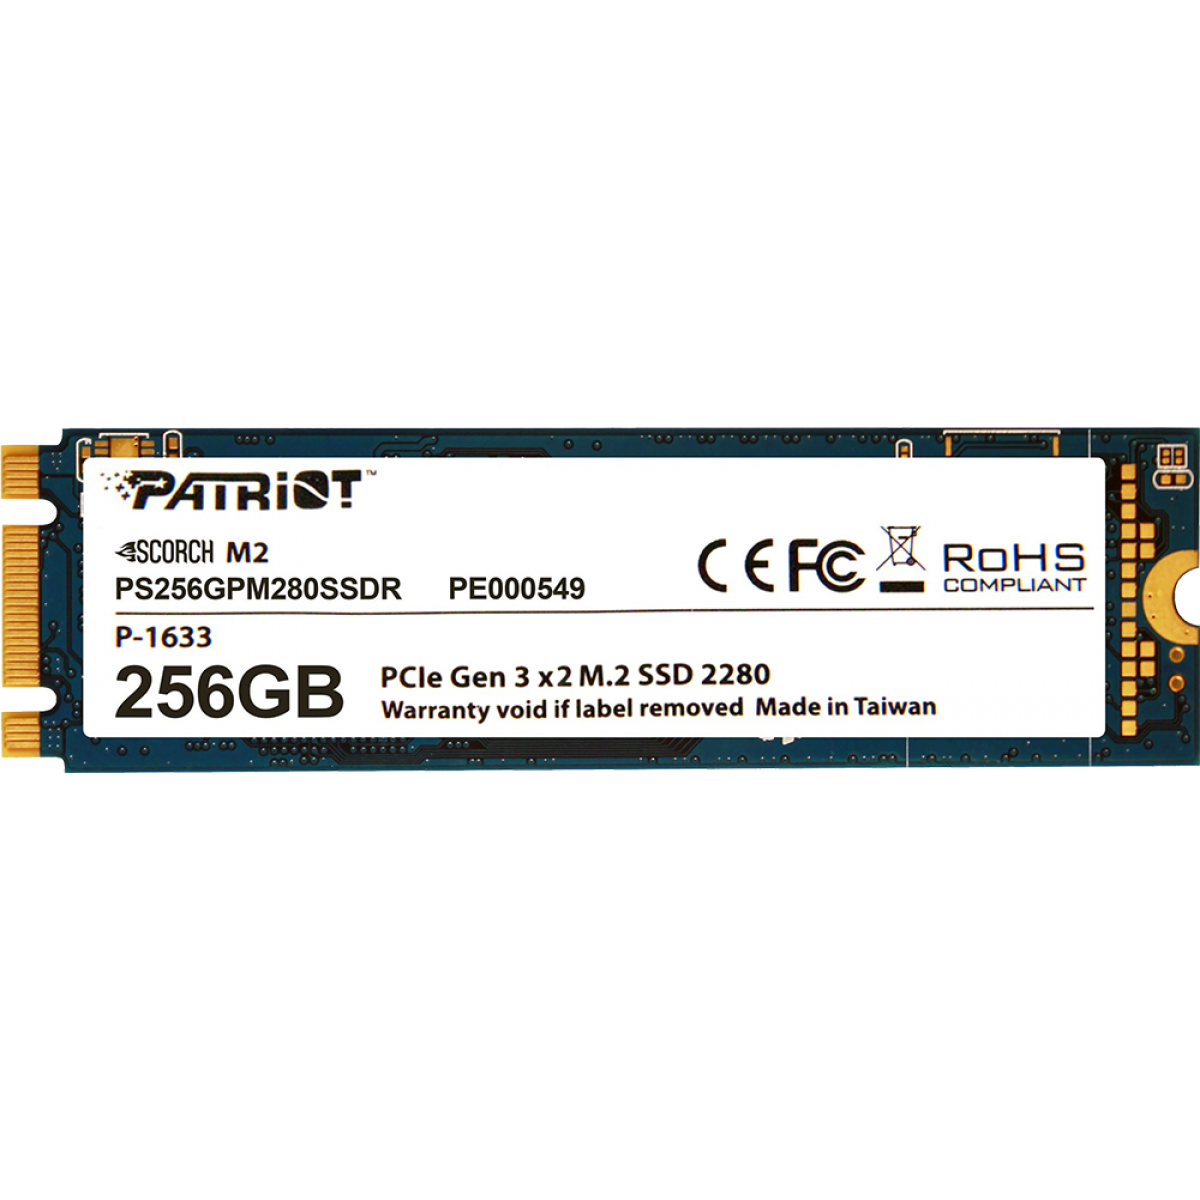 SSD Patriot Scorch M.2 80mm, 256GB, Leitura 1700MBs e Gravação 780MBs, PS256GPM280SSDR